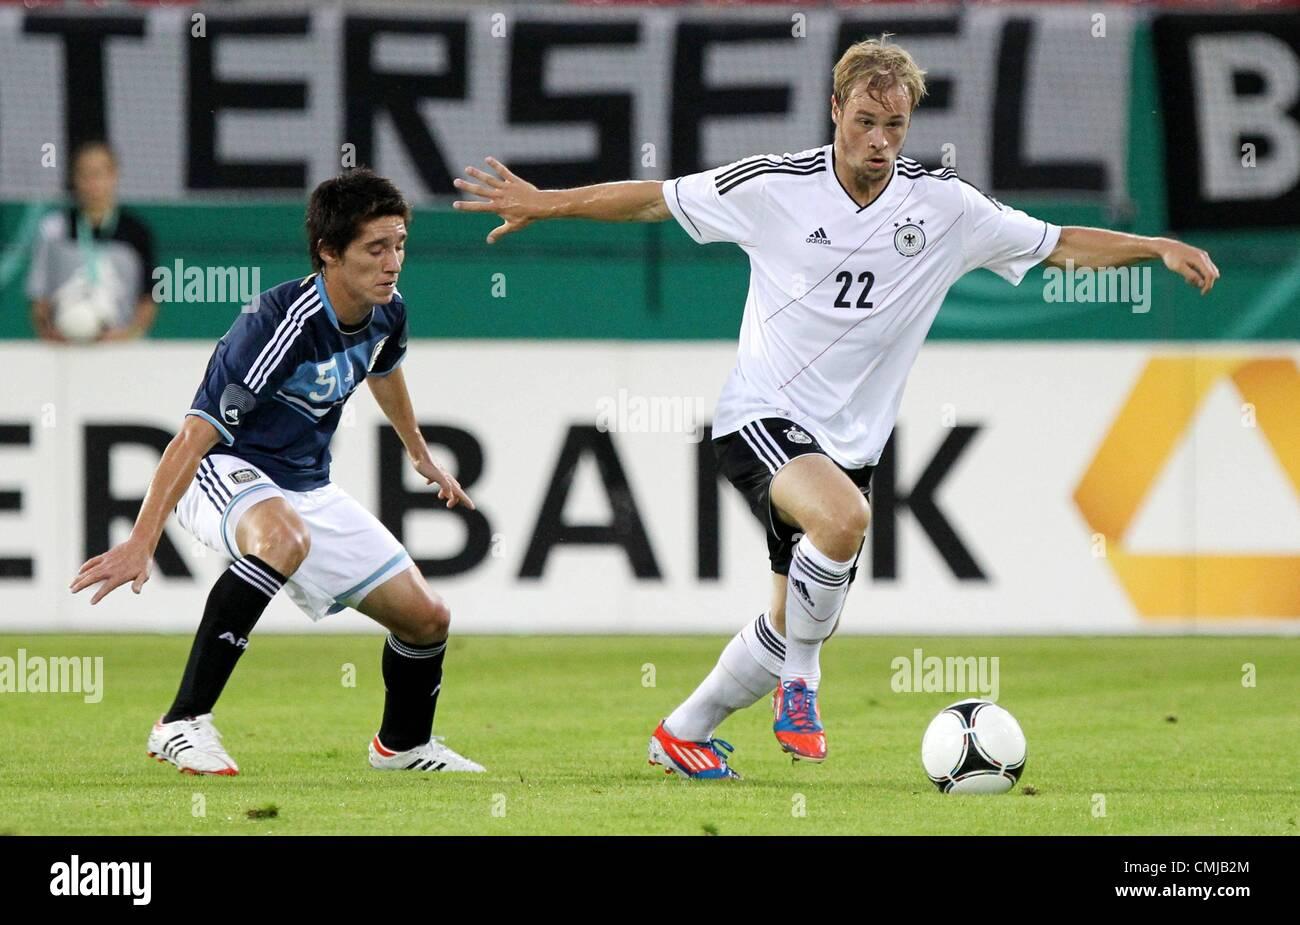 14 08 2012  Hess country ger U21 international match Germany vs Argentina 14 08 12 Offenbach at Main Stadium Bieberer - Stock Image